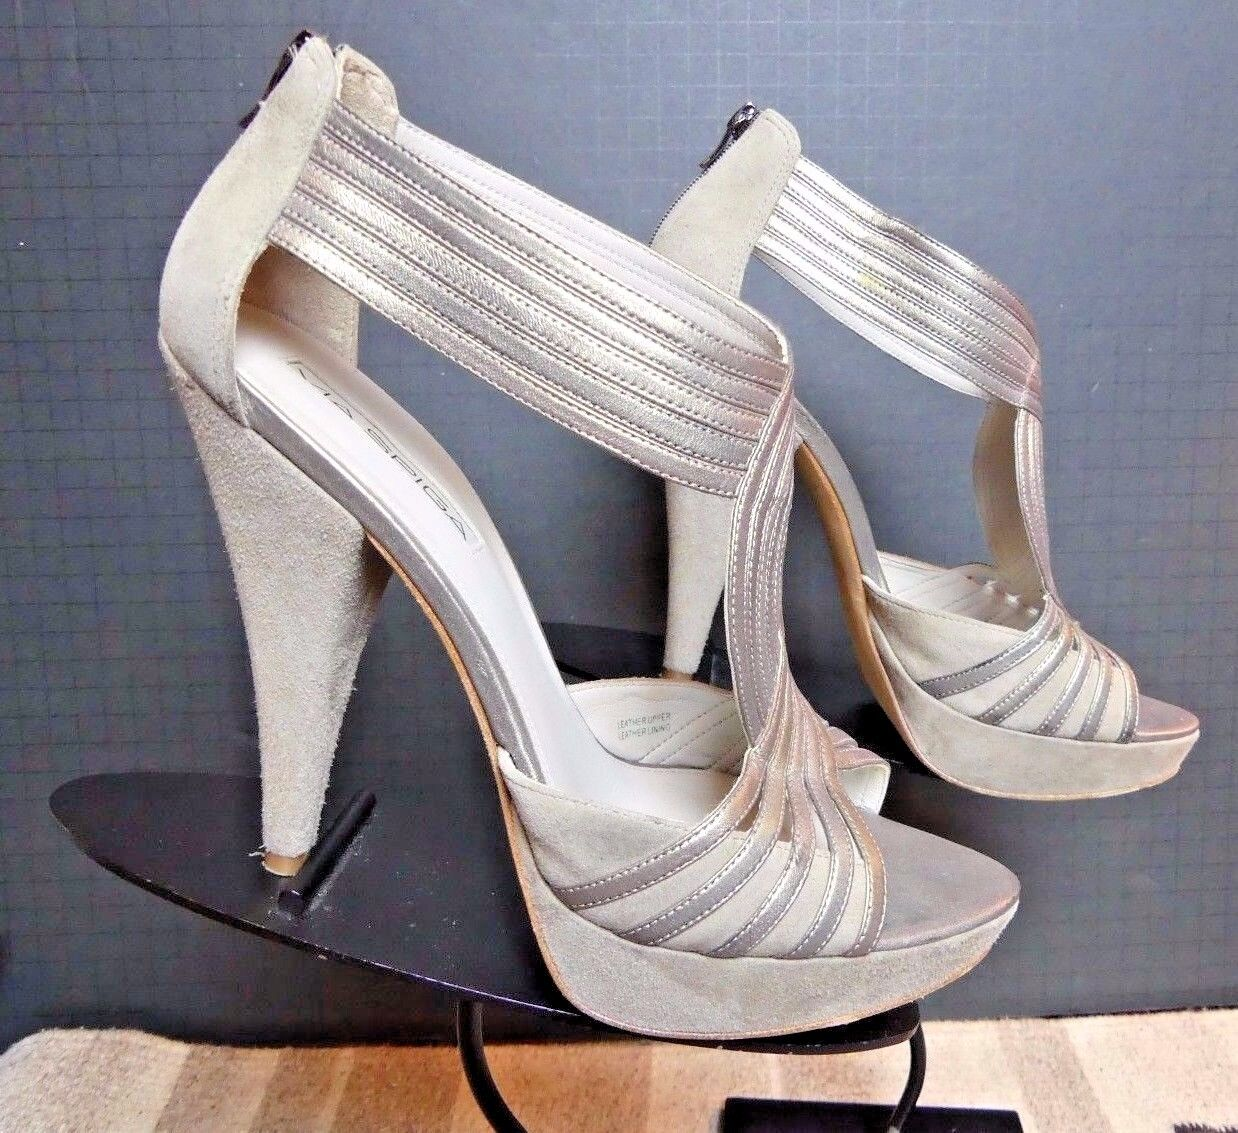 bellissima Donna    Via Spiga  grigio Suede Smooth Leather Ankle Strap Heels Sz 9.5 MINTY  il più recente